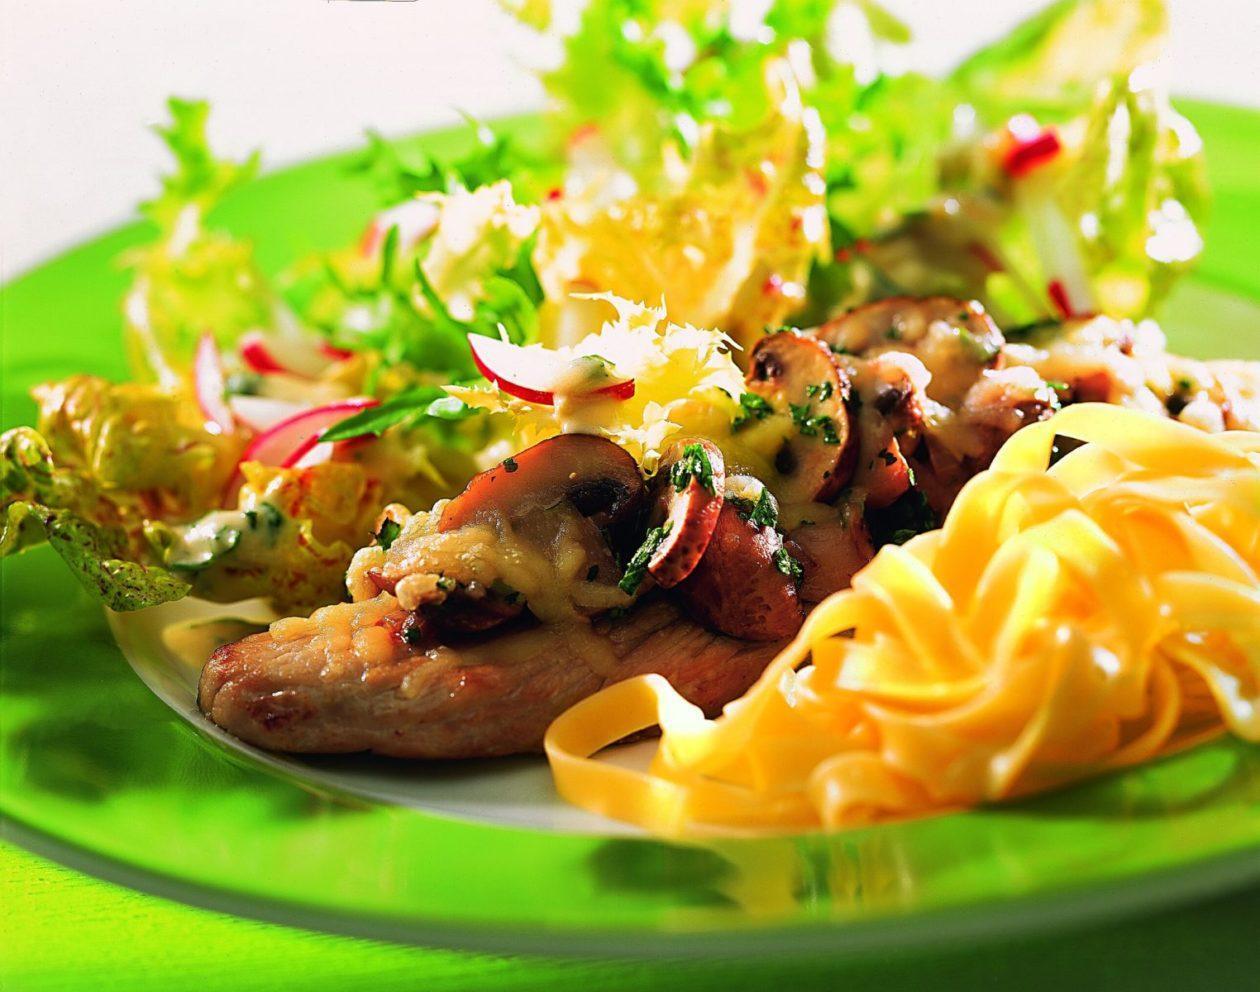 gratinierte champignonschnitzel